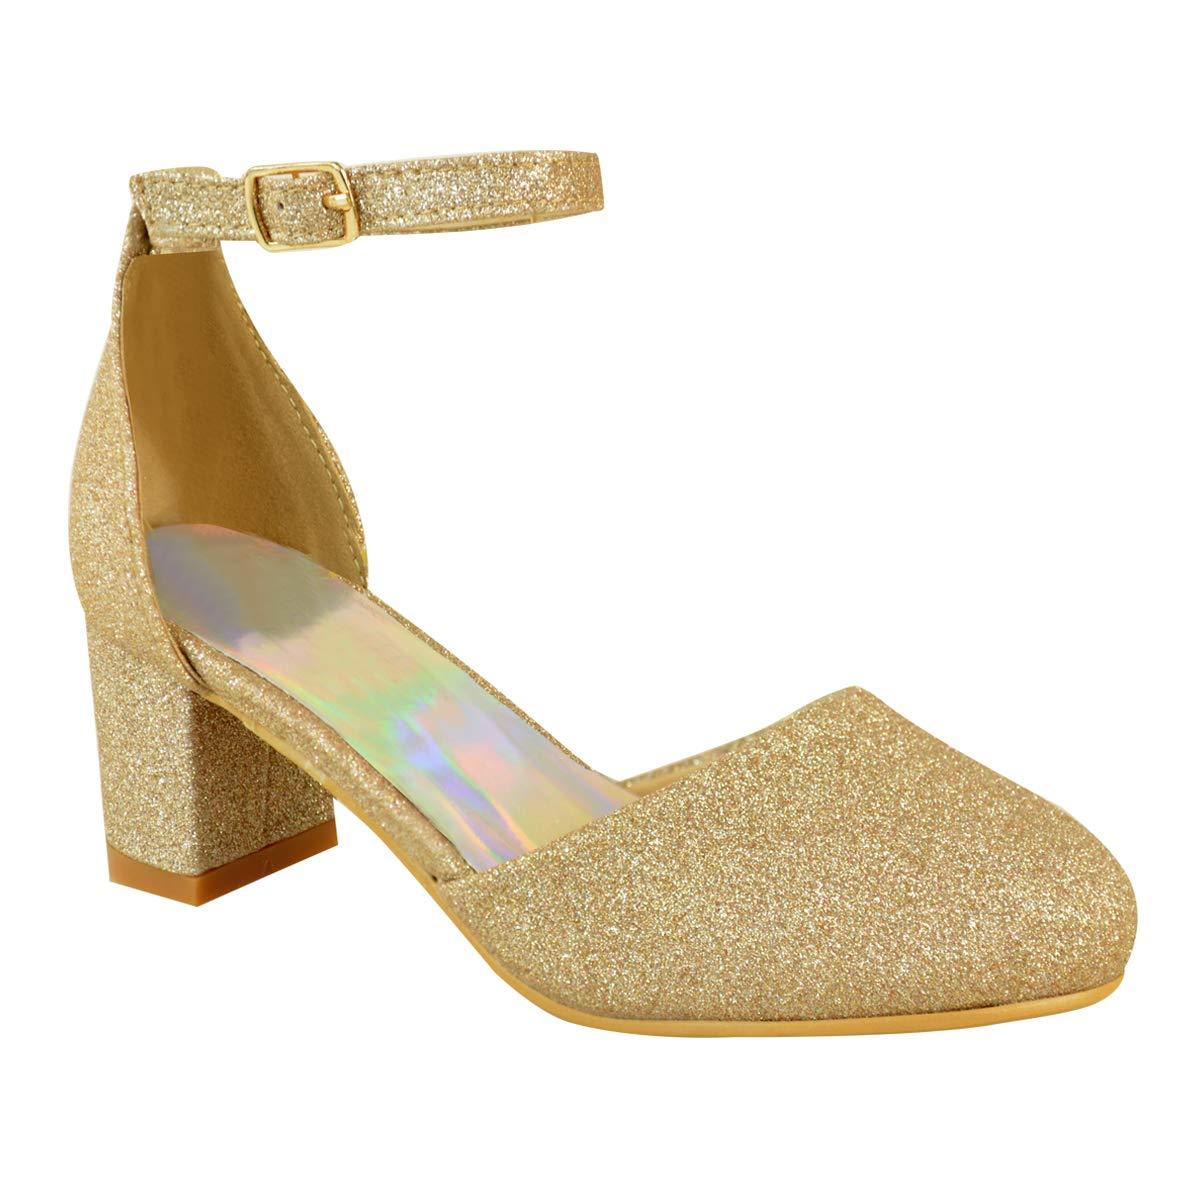 8678379d125 CHILDRENS GIRLS KIDS MID LOW HIGH HEEL DIAMANTE PARTY SHOES BRIDAL SANDALS  SIZE  Amazon.co.uk  Shoes   Bags